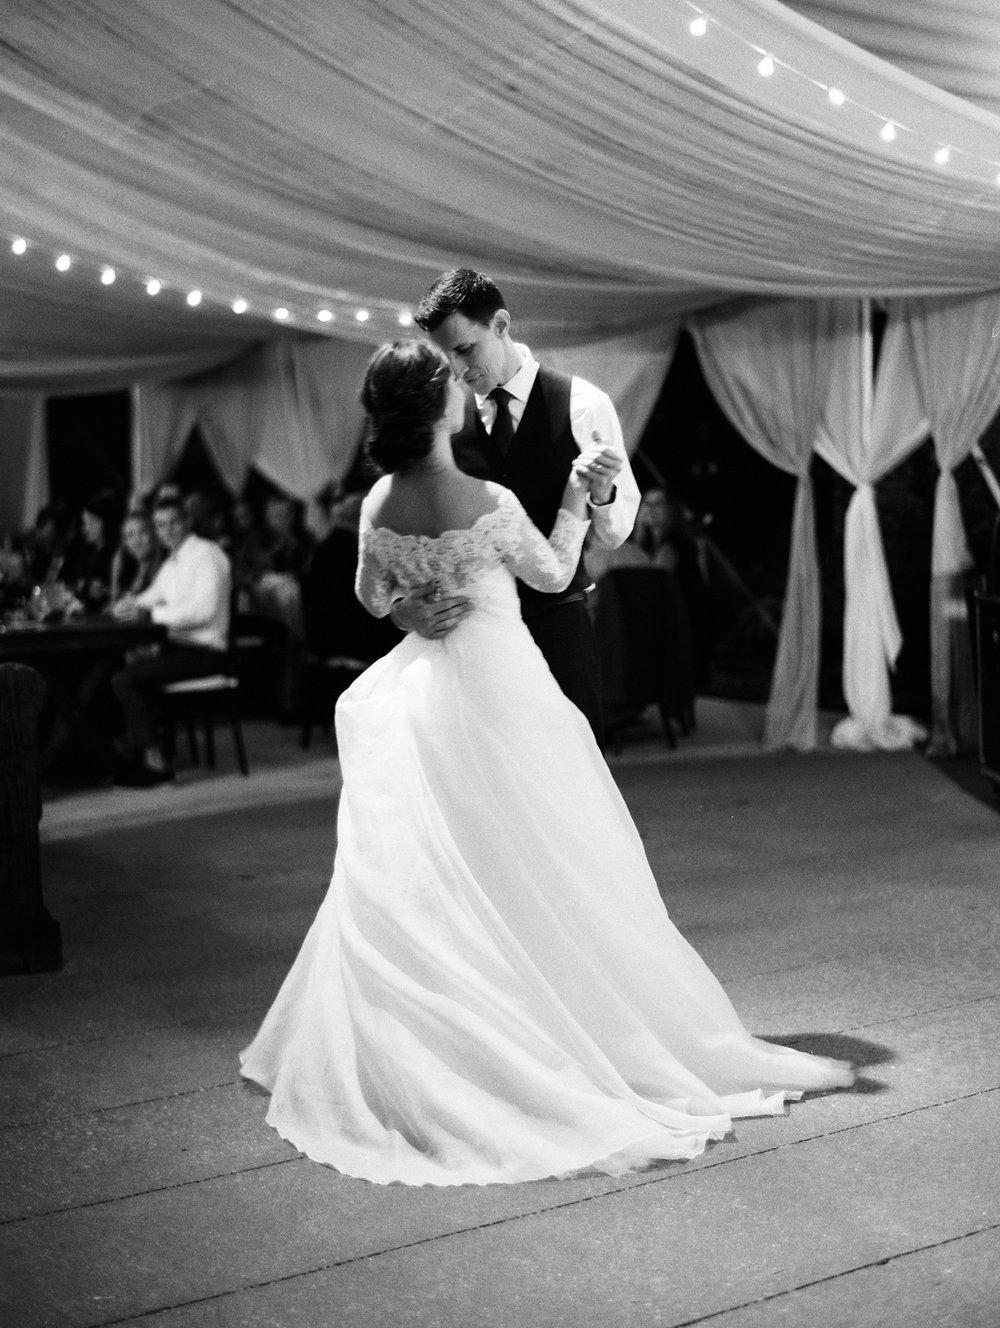 gassaway-mansion-greenville-south-carolina-luxury-film-wedding-photographer-48.jpg